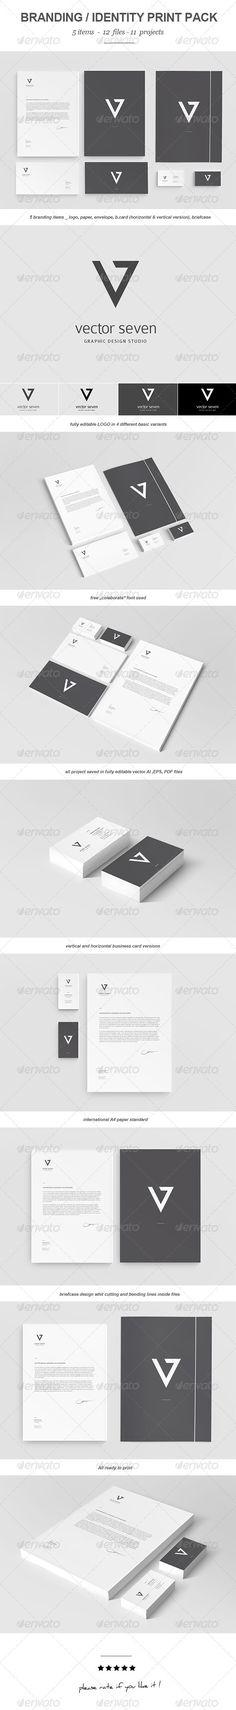 Seven Vector Branding Print Pack #GraphicRiver